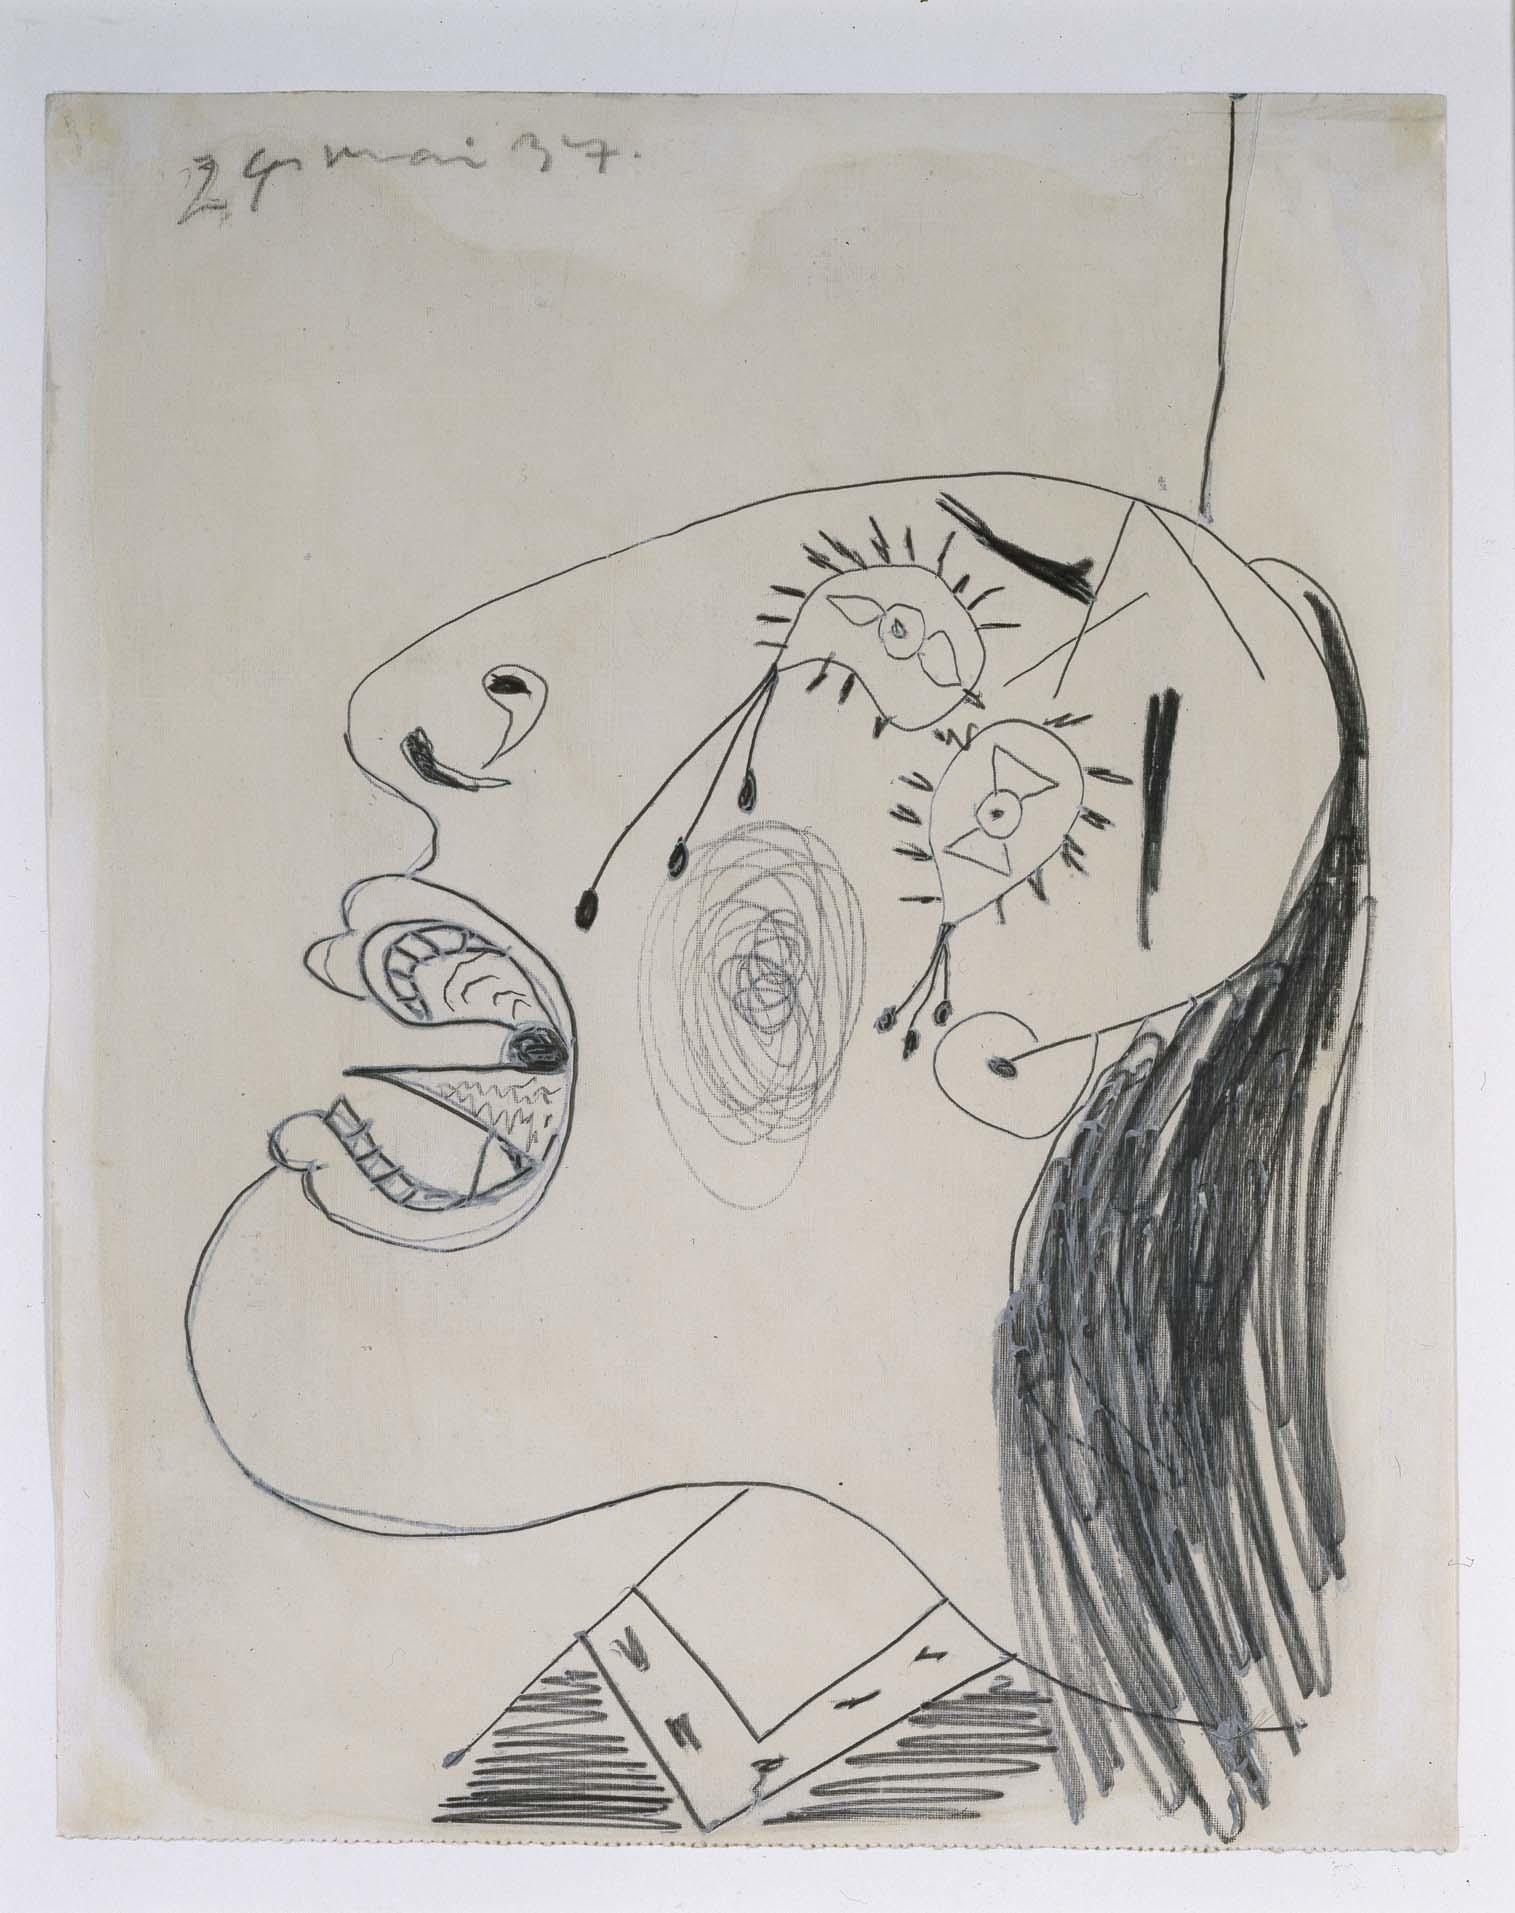 Pablo Picasso (Pablo Ruiz Picasso) - Estudio de cabeza llorando (I). Dibujo preparatorio para «Guernica»